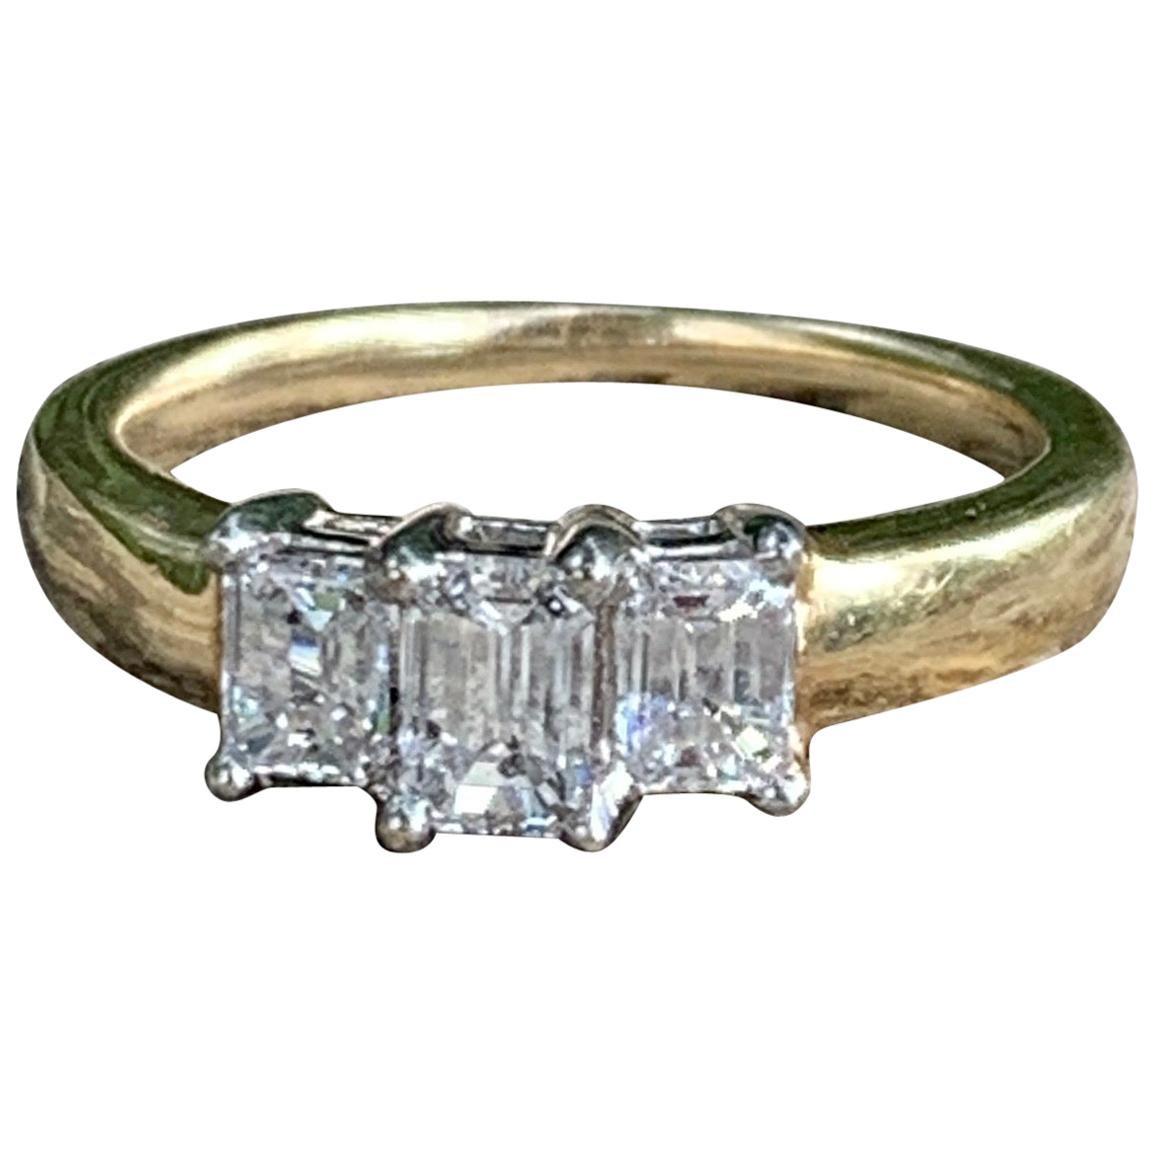 Three-Stone Emerald Cut Diamond 14 Karat Yellow and White Gold Ring - Size 8